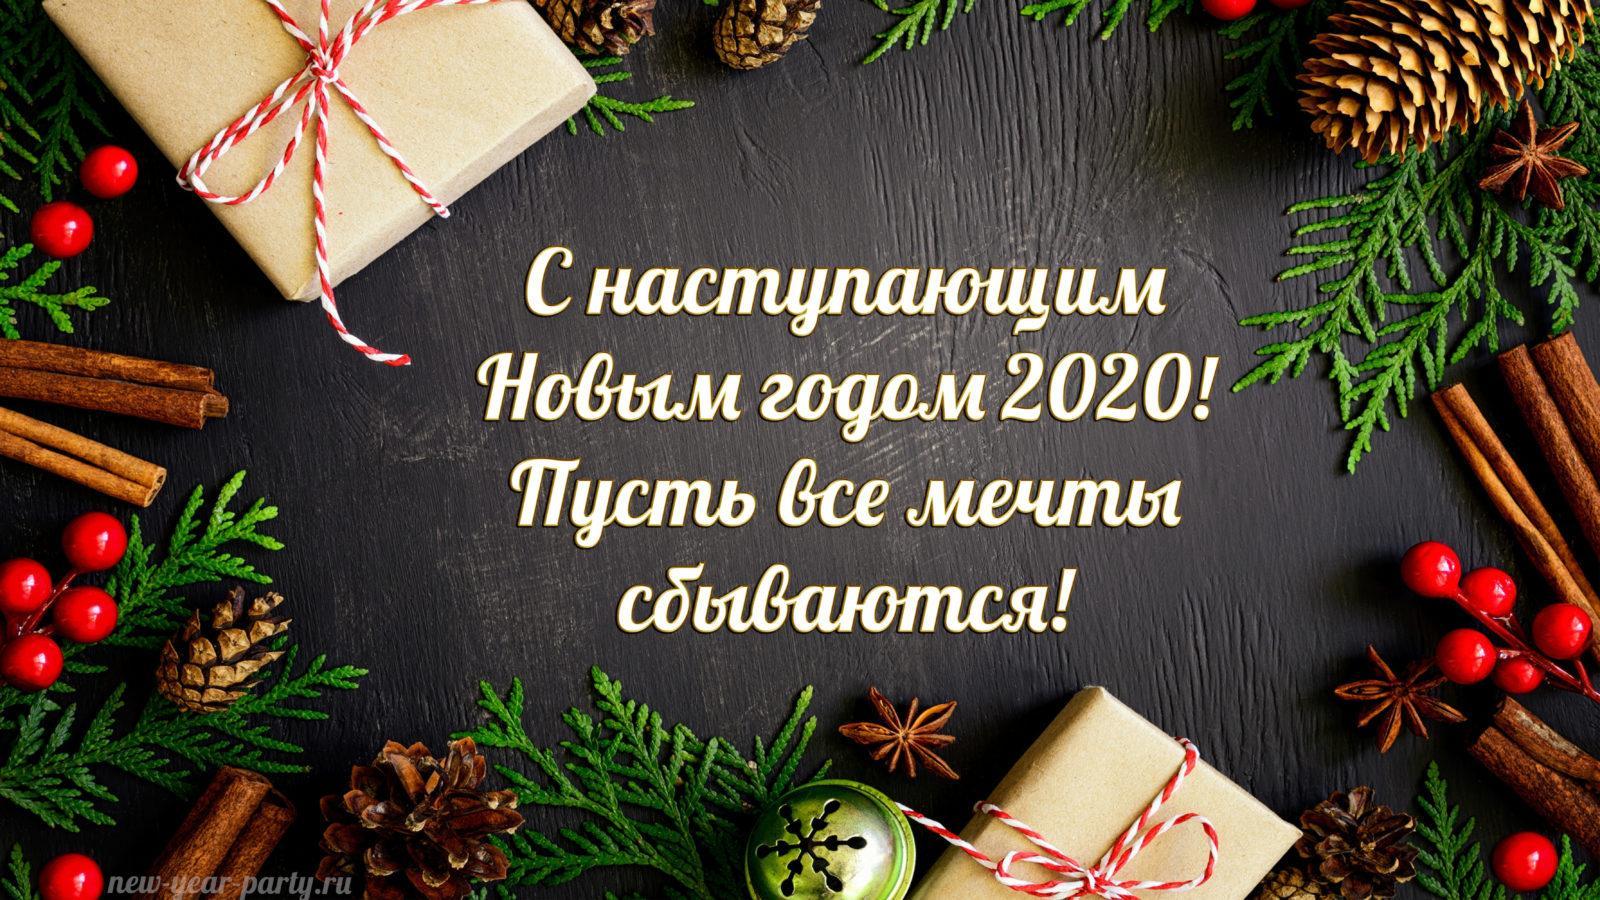 https://ecopoli.ru/images/upload/2020-22.jpg